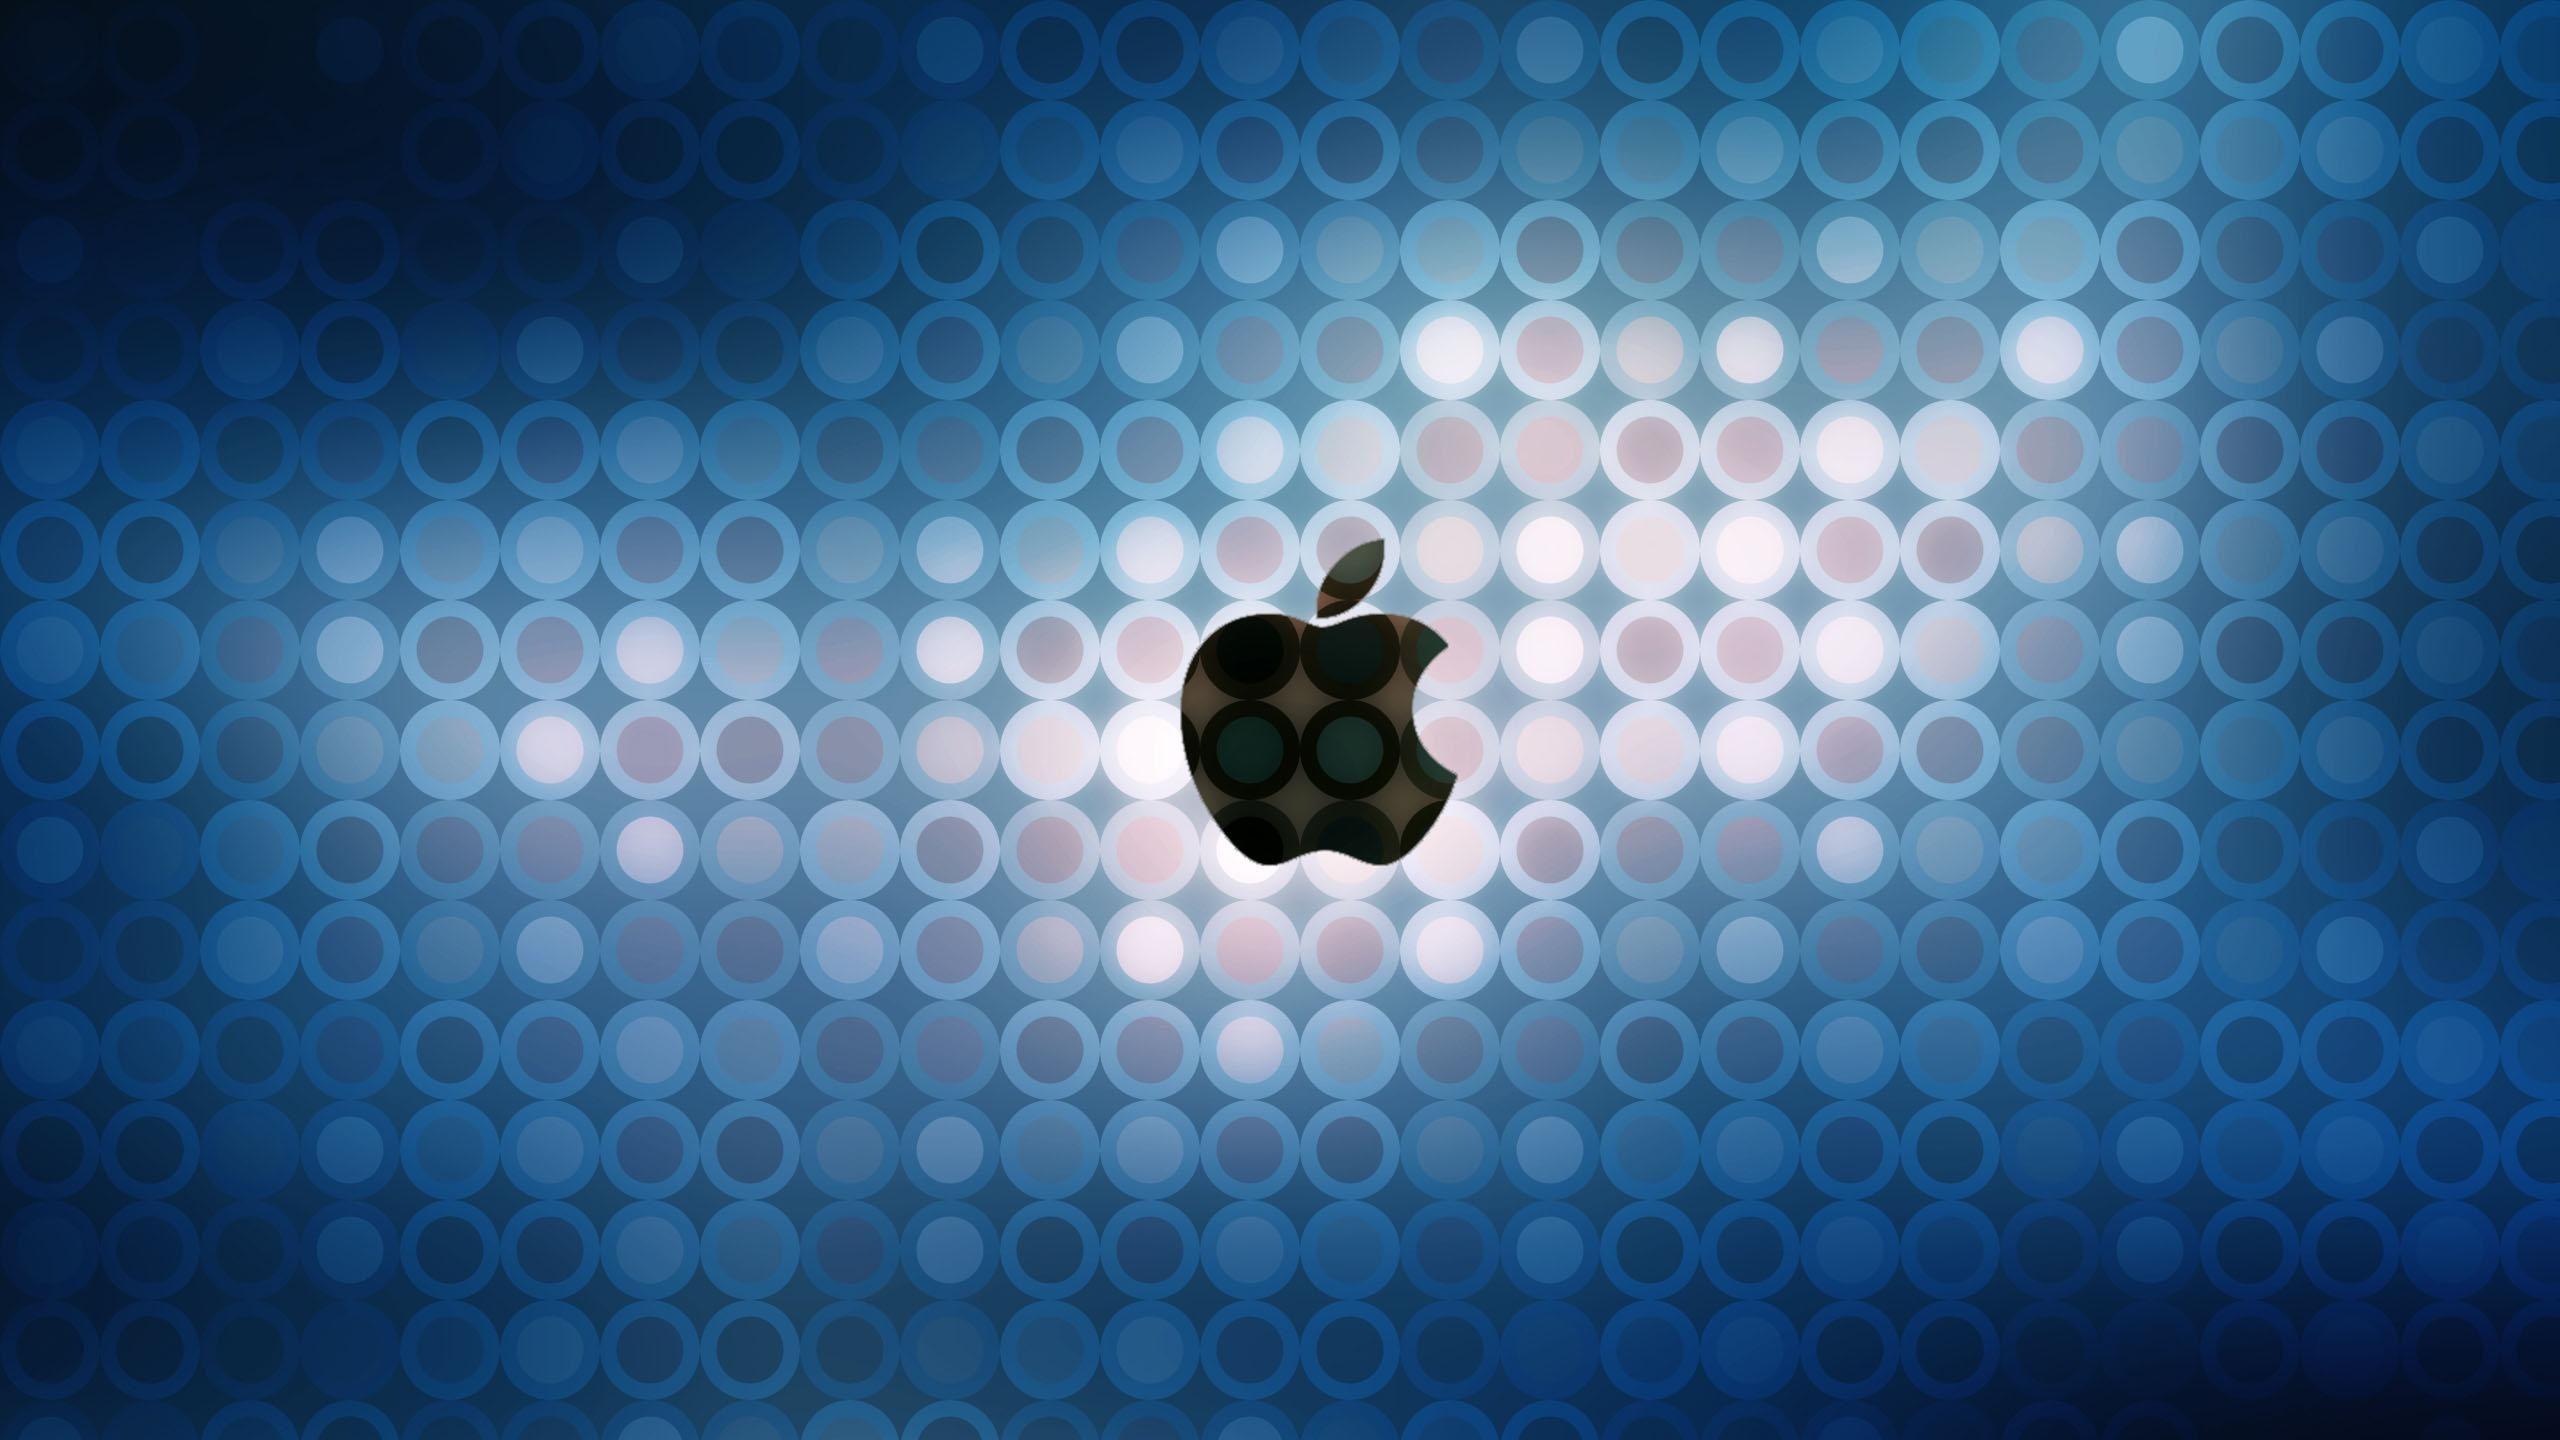 sunflower desktop wallpapers hd wallpapers pop 2560a—1440 free desktop wallpapers for mac 39